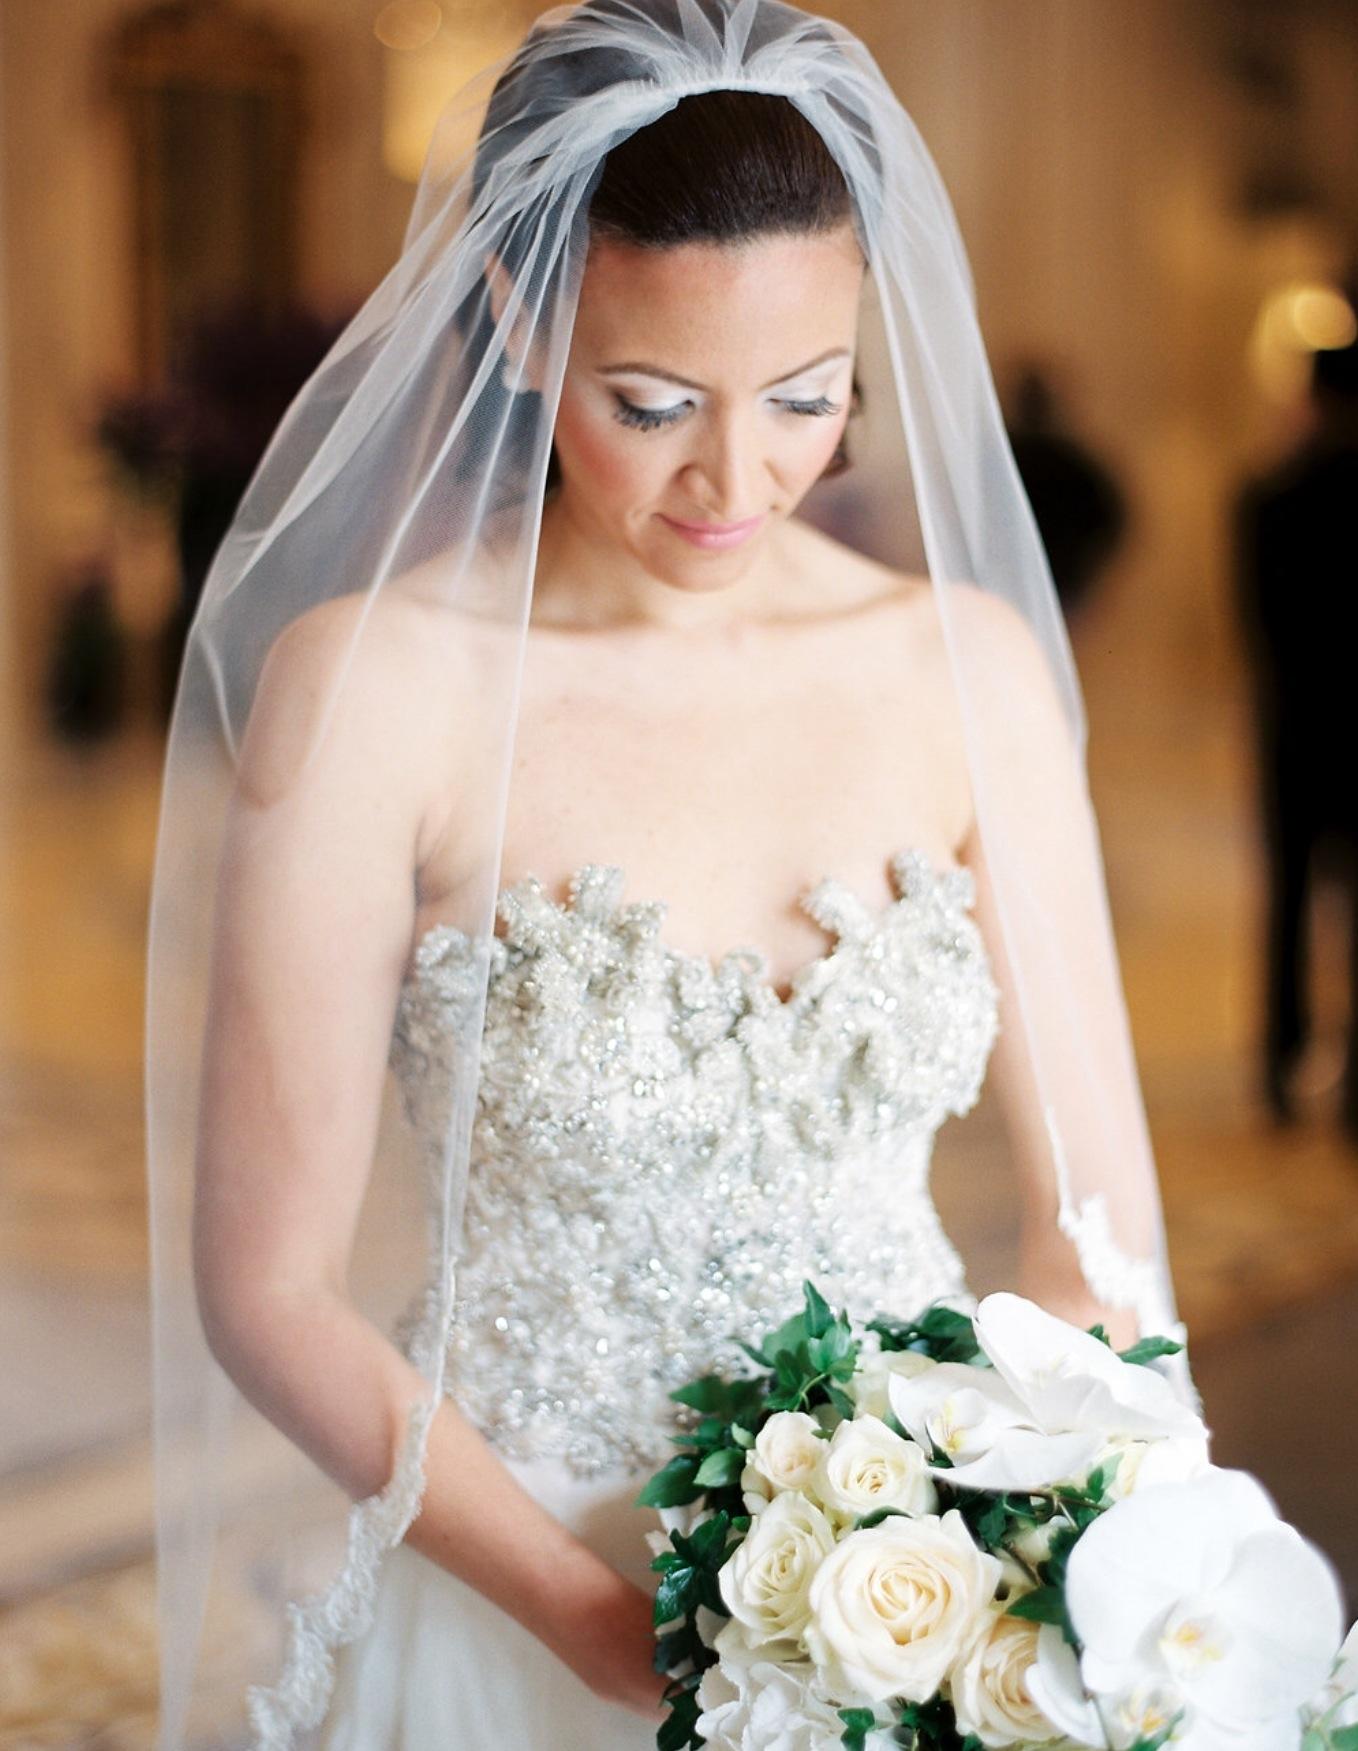 Maquillage «mariée»